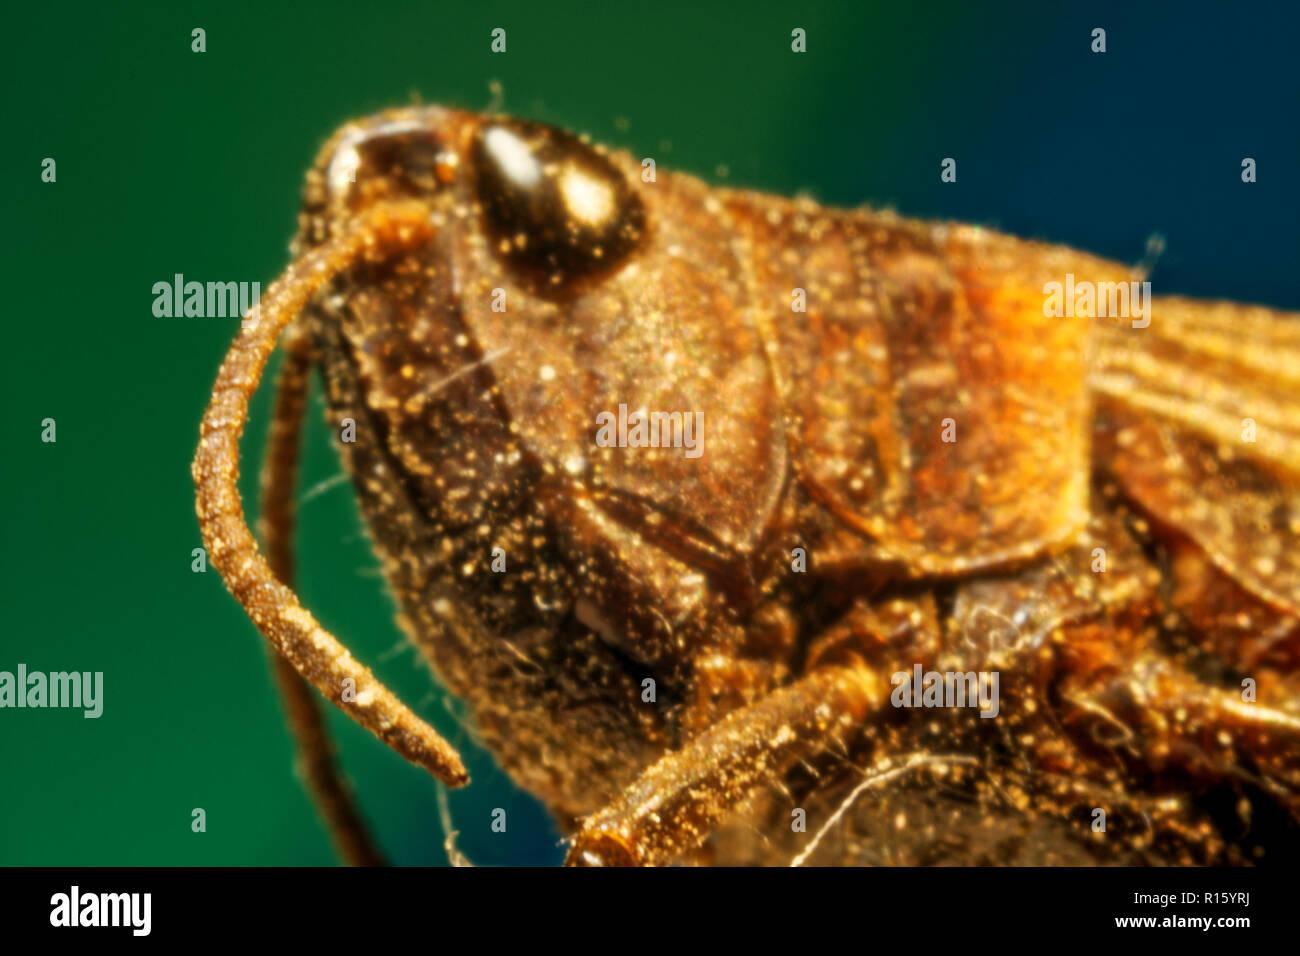 Photo Grasshopper (Tettigonioidea),superfamily orthopterous insects, long-boiled suborder - Stock Image